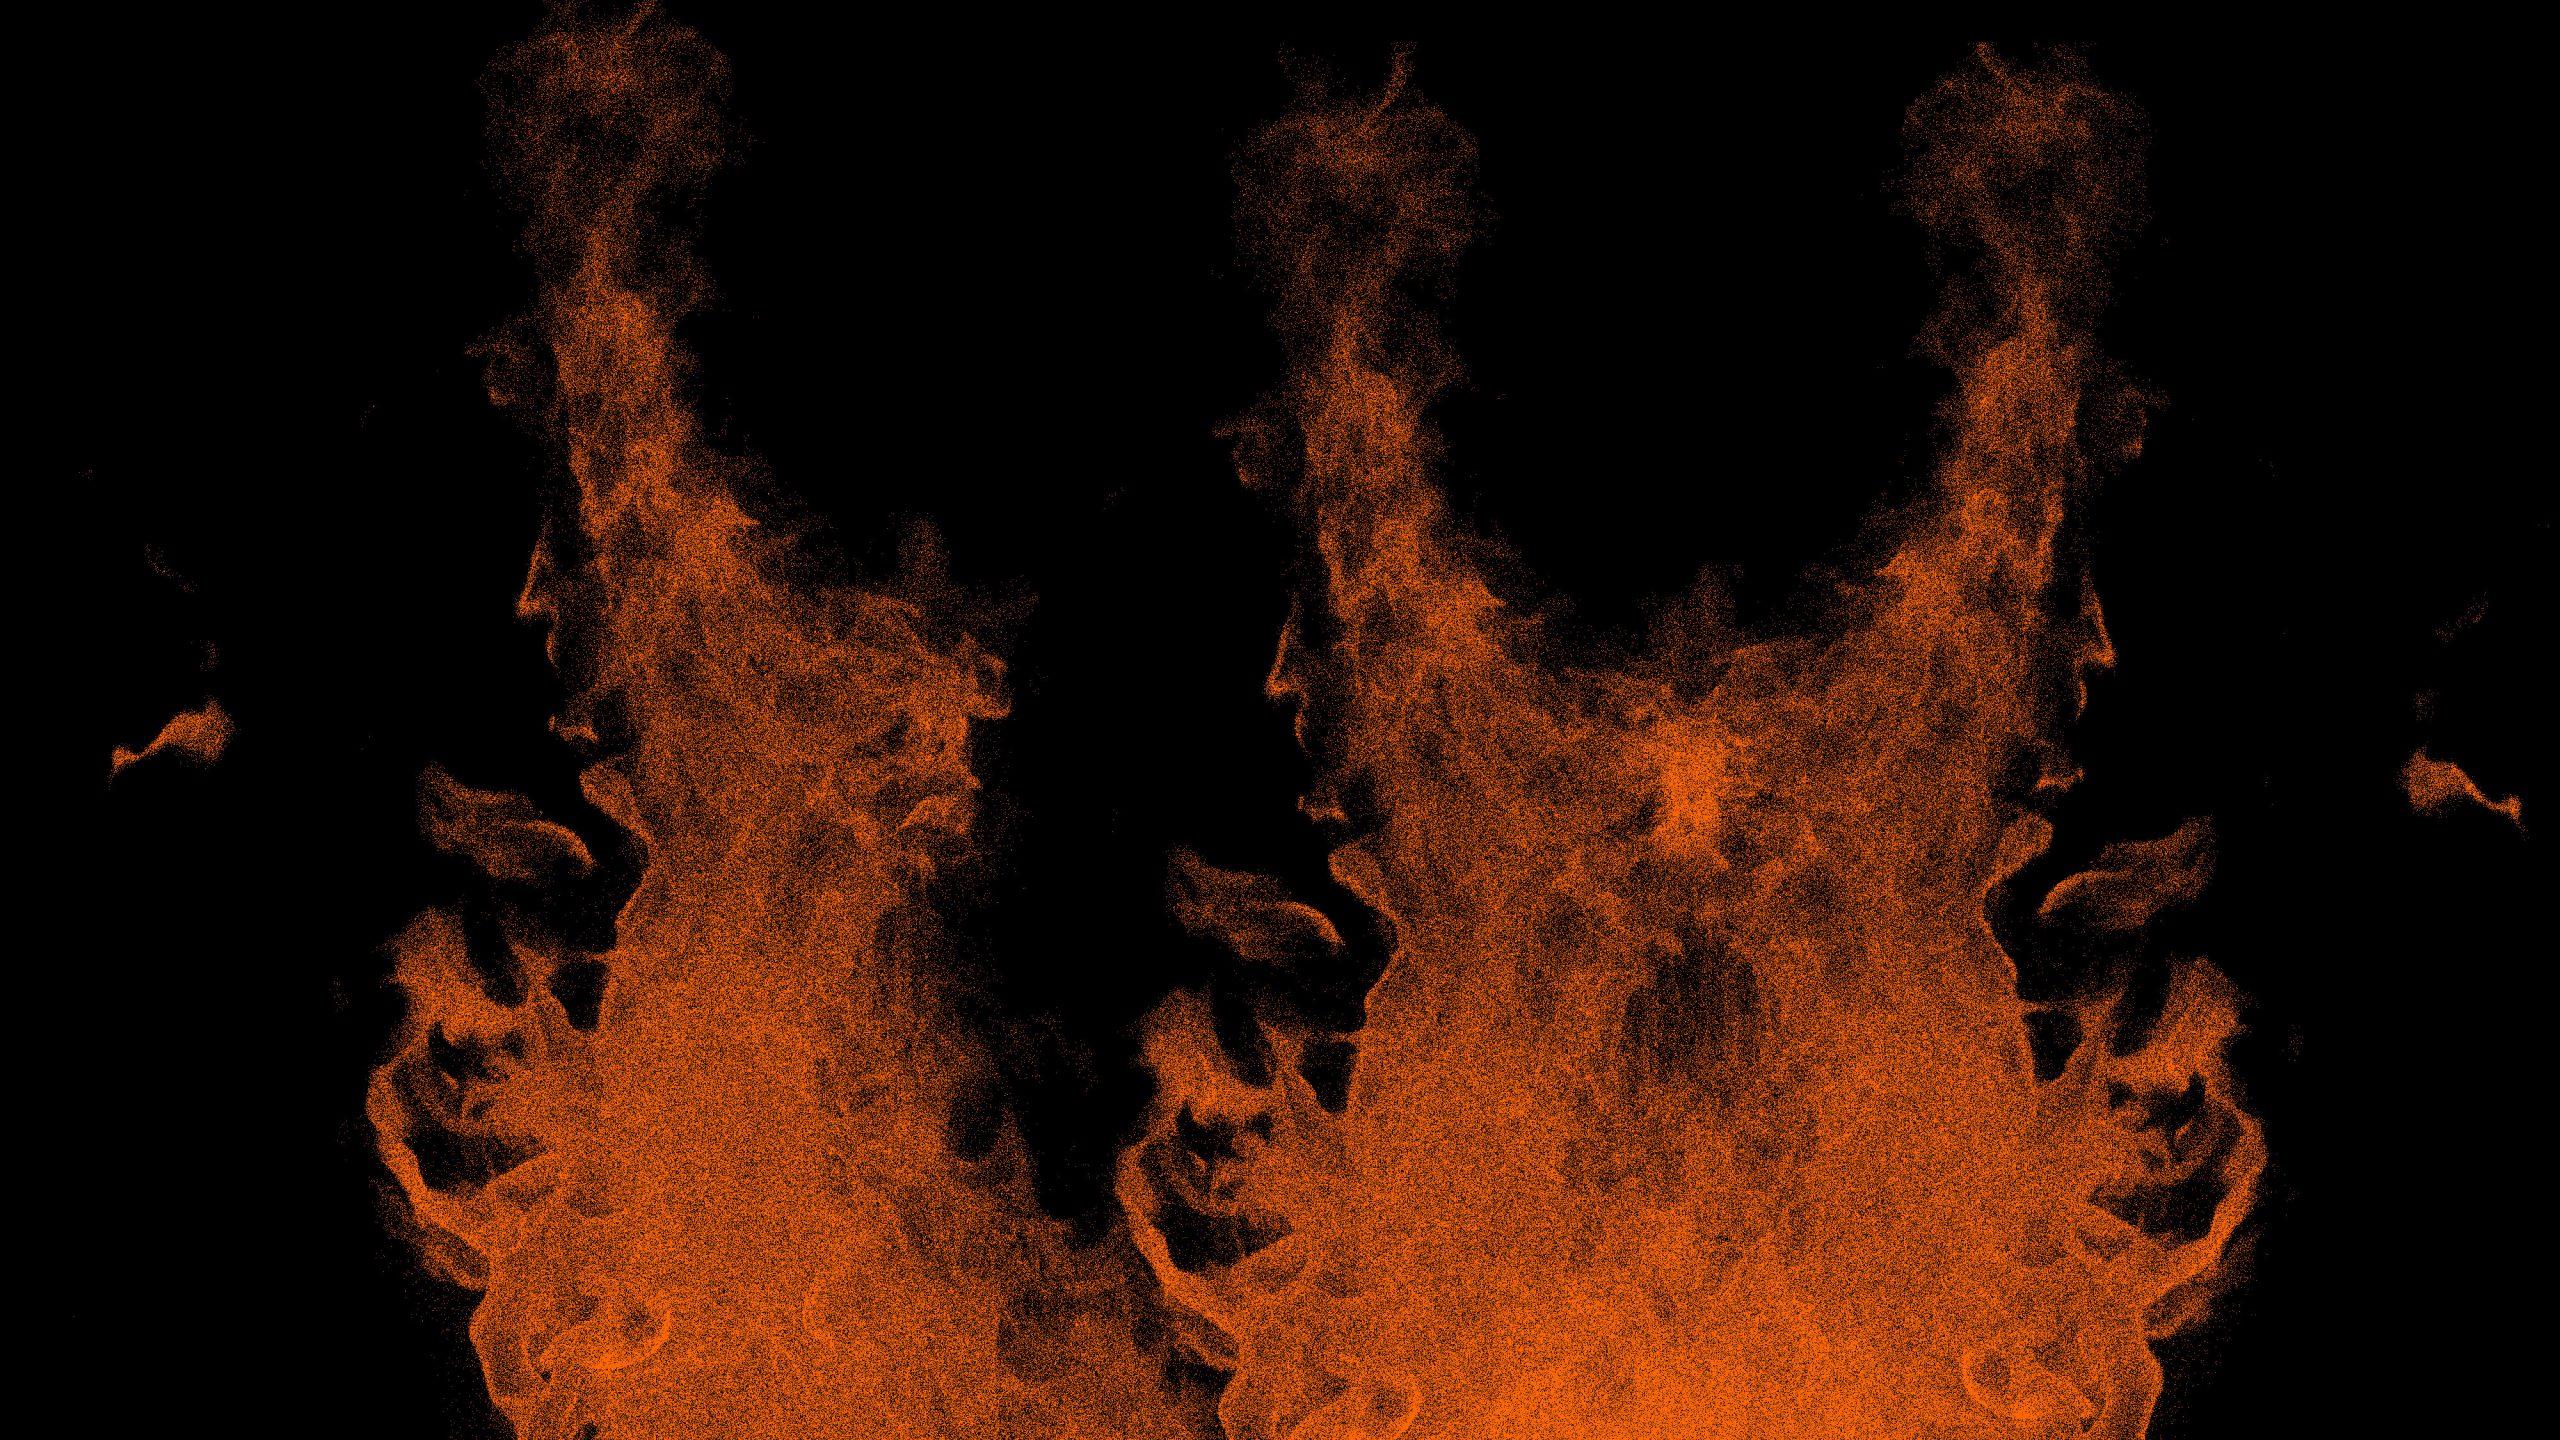 Fire flames illustration